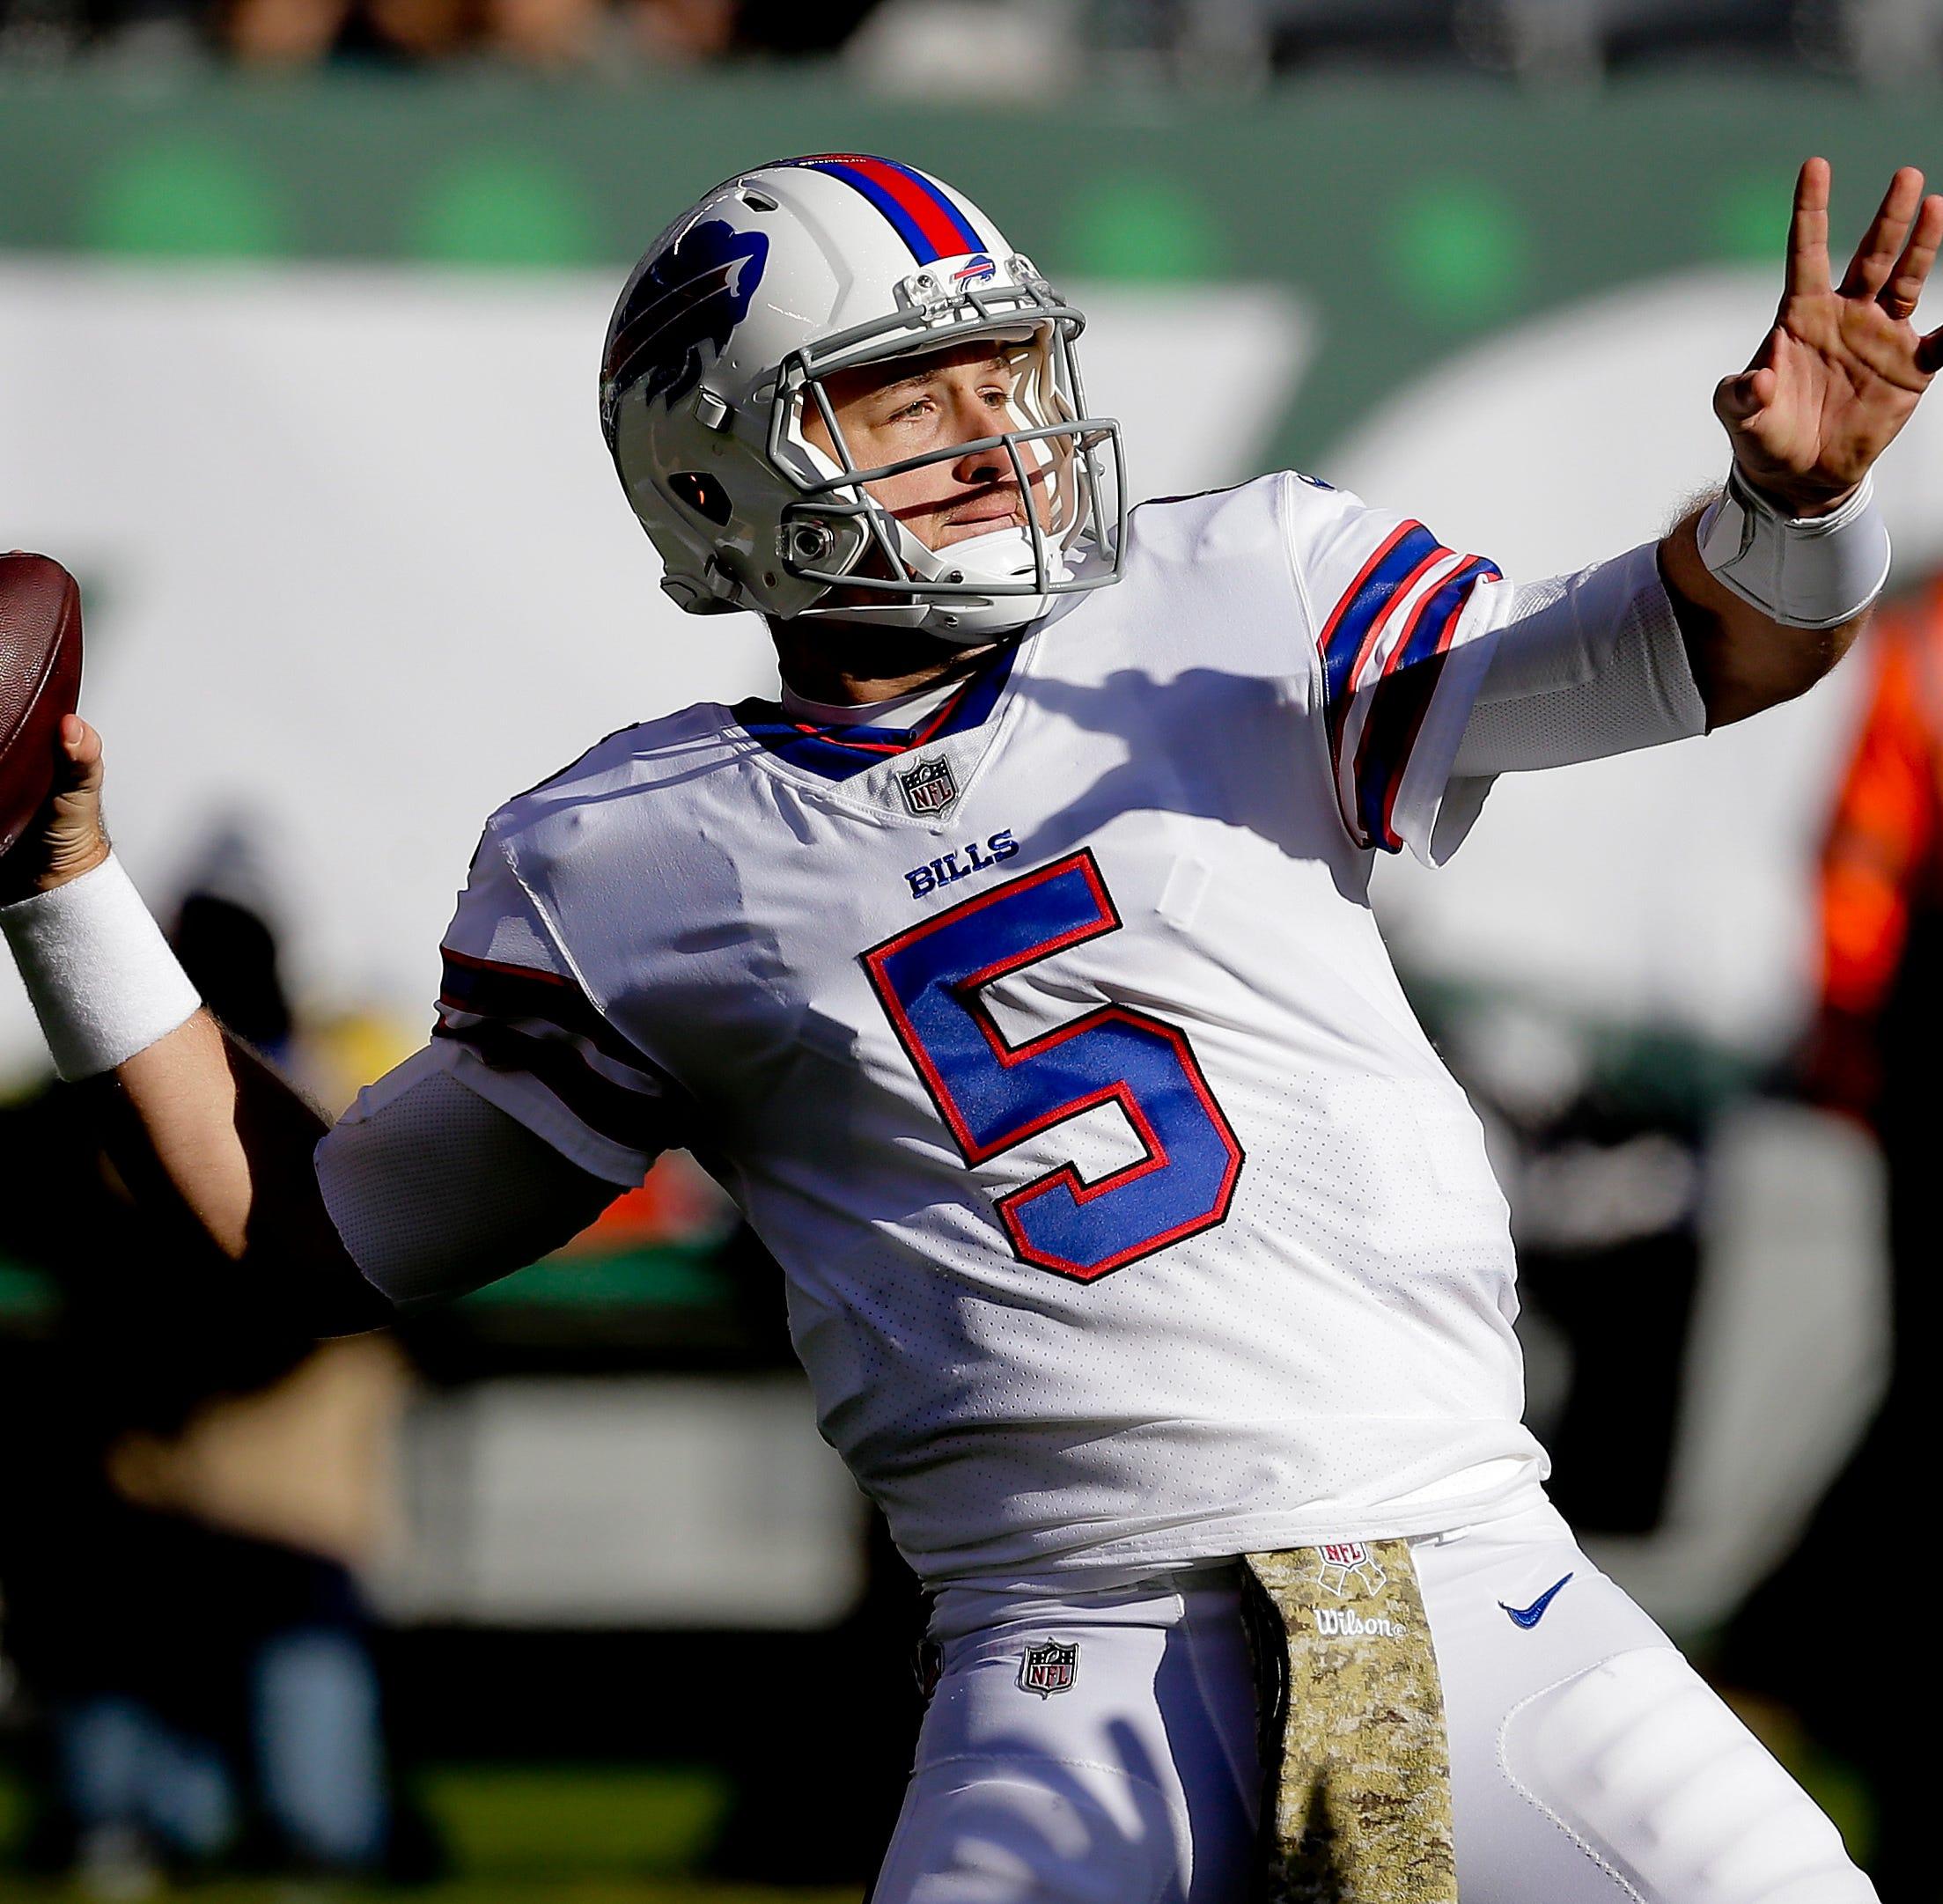 Matt Barkley and Buffalo Bills are embarrassing the New York Jets